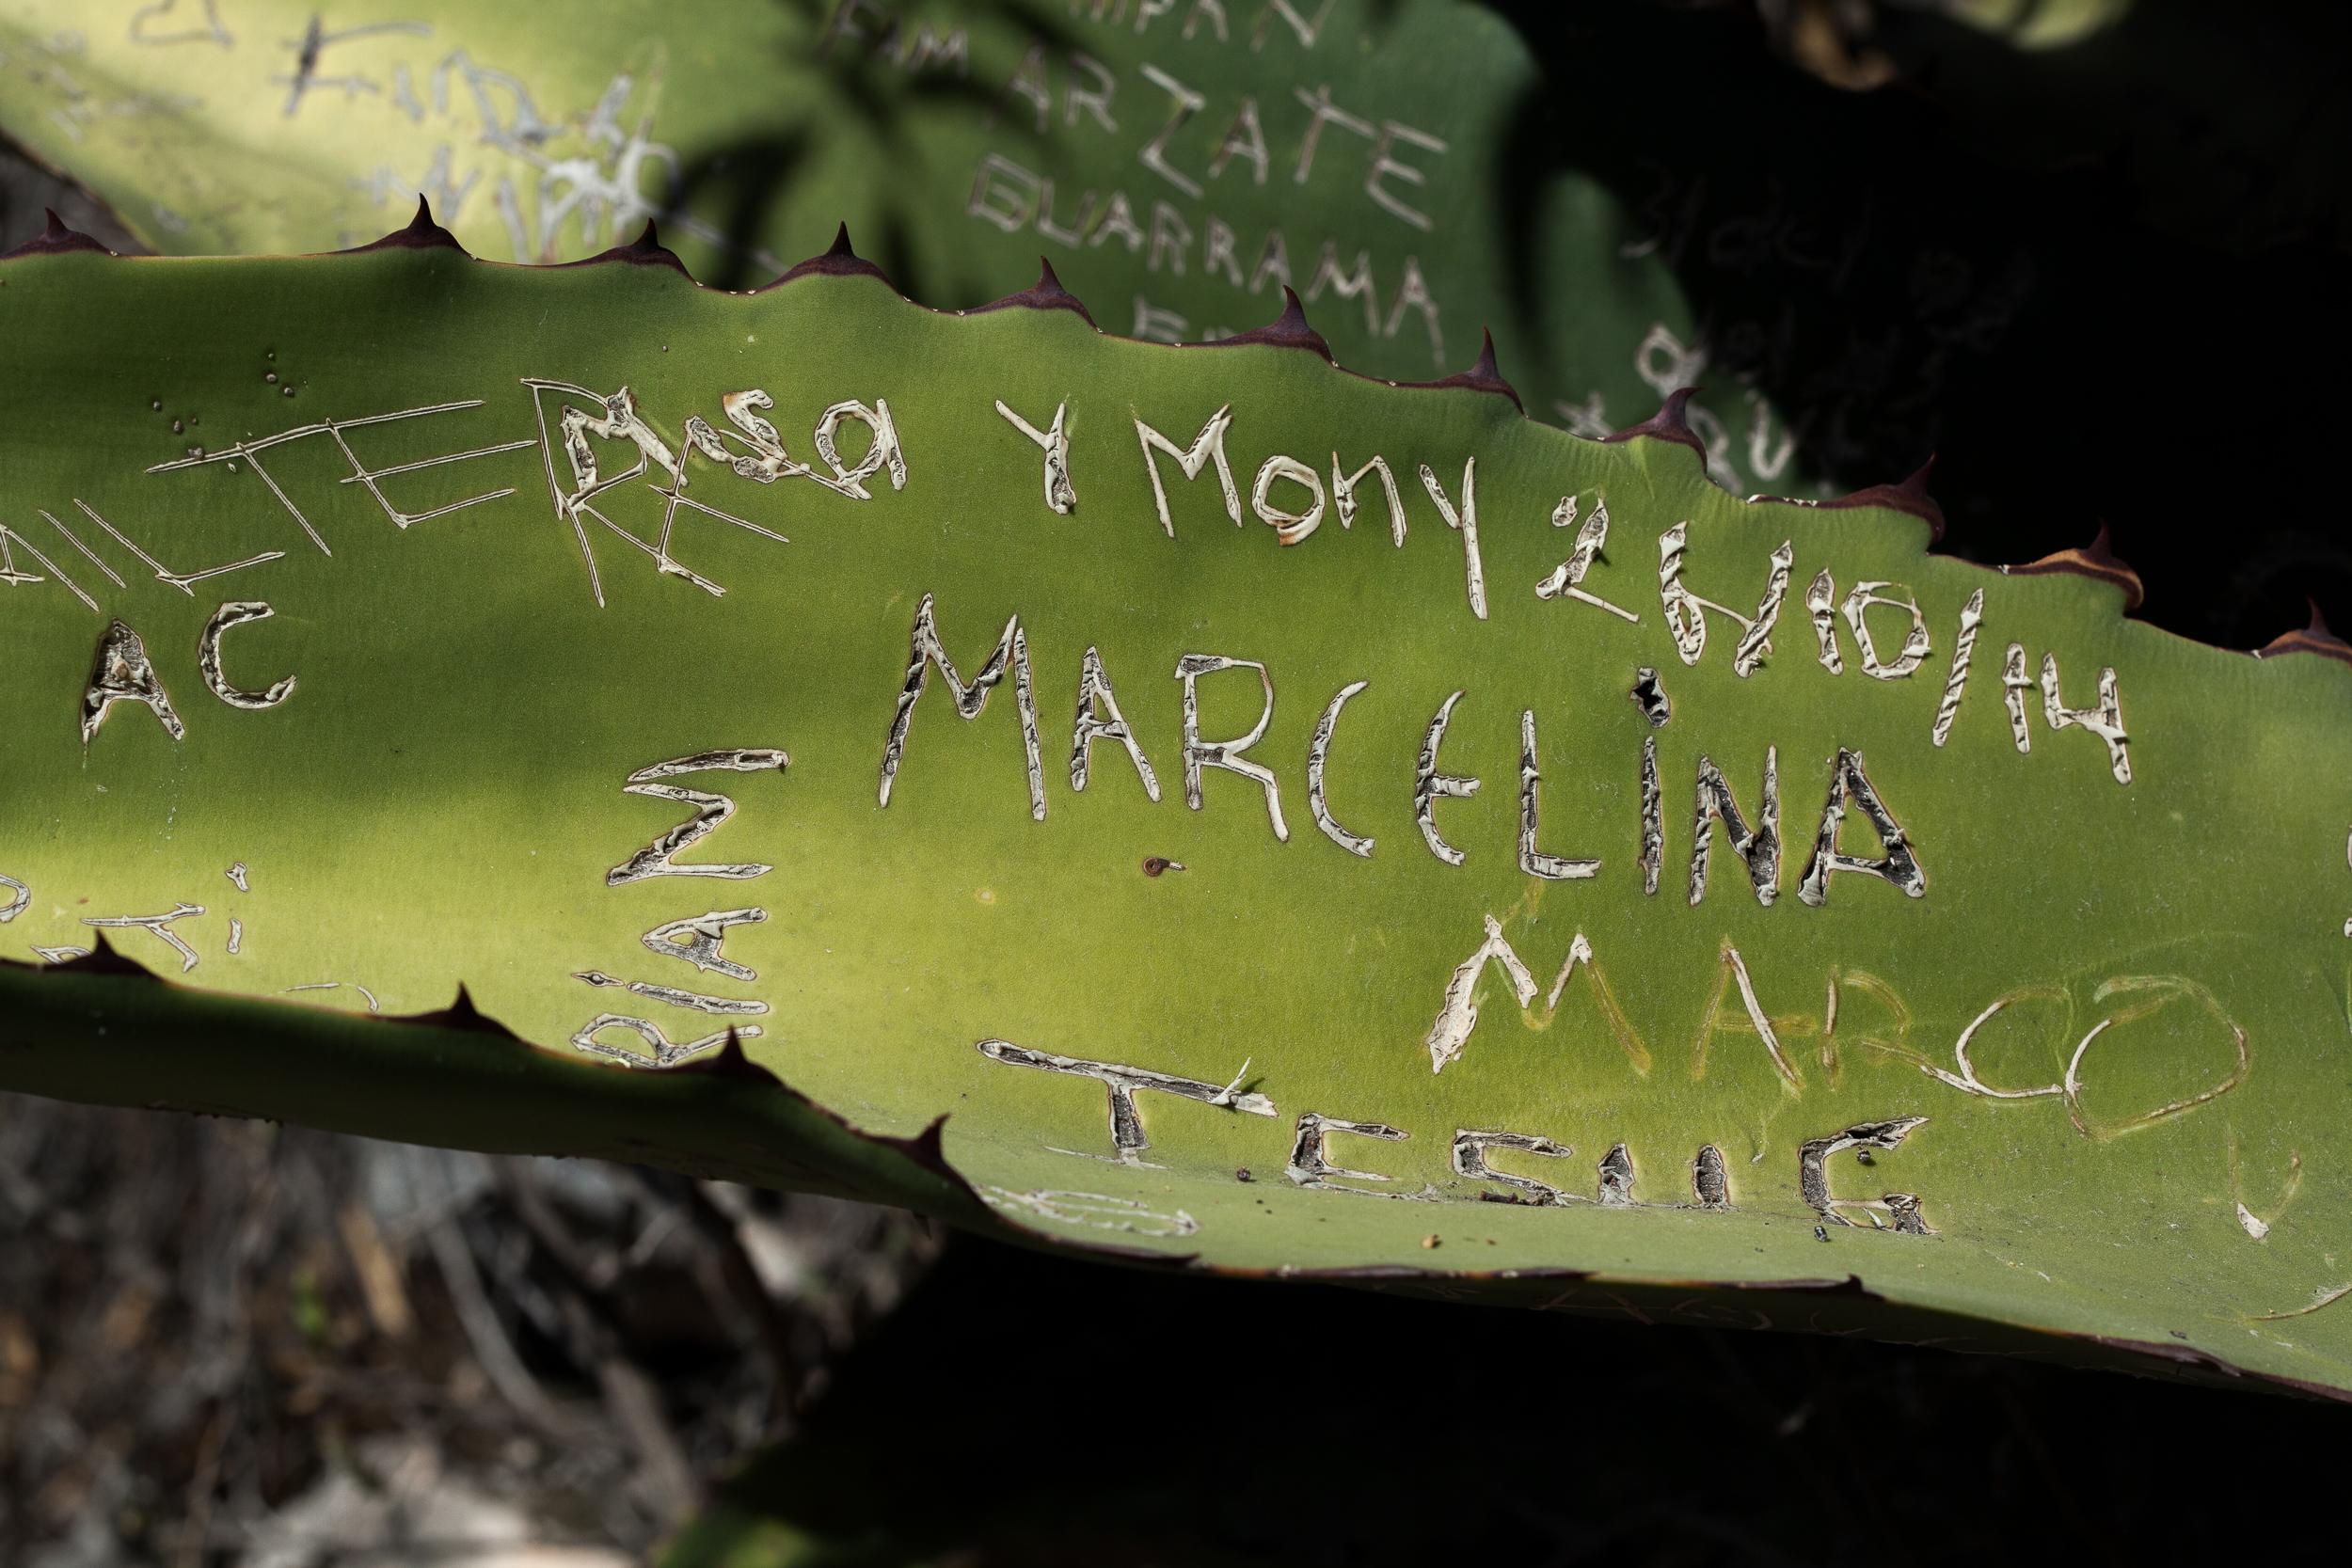 Chacon Images_Oaxaca_Travel_WEB_-2001.jpg